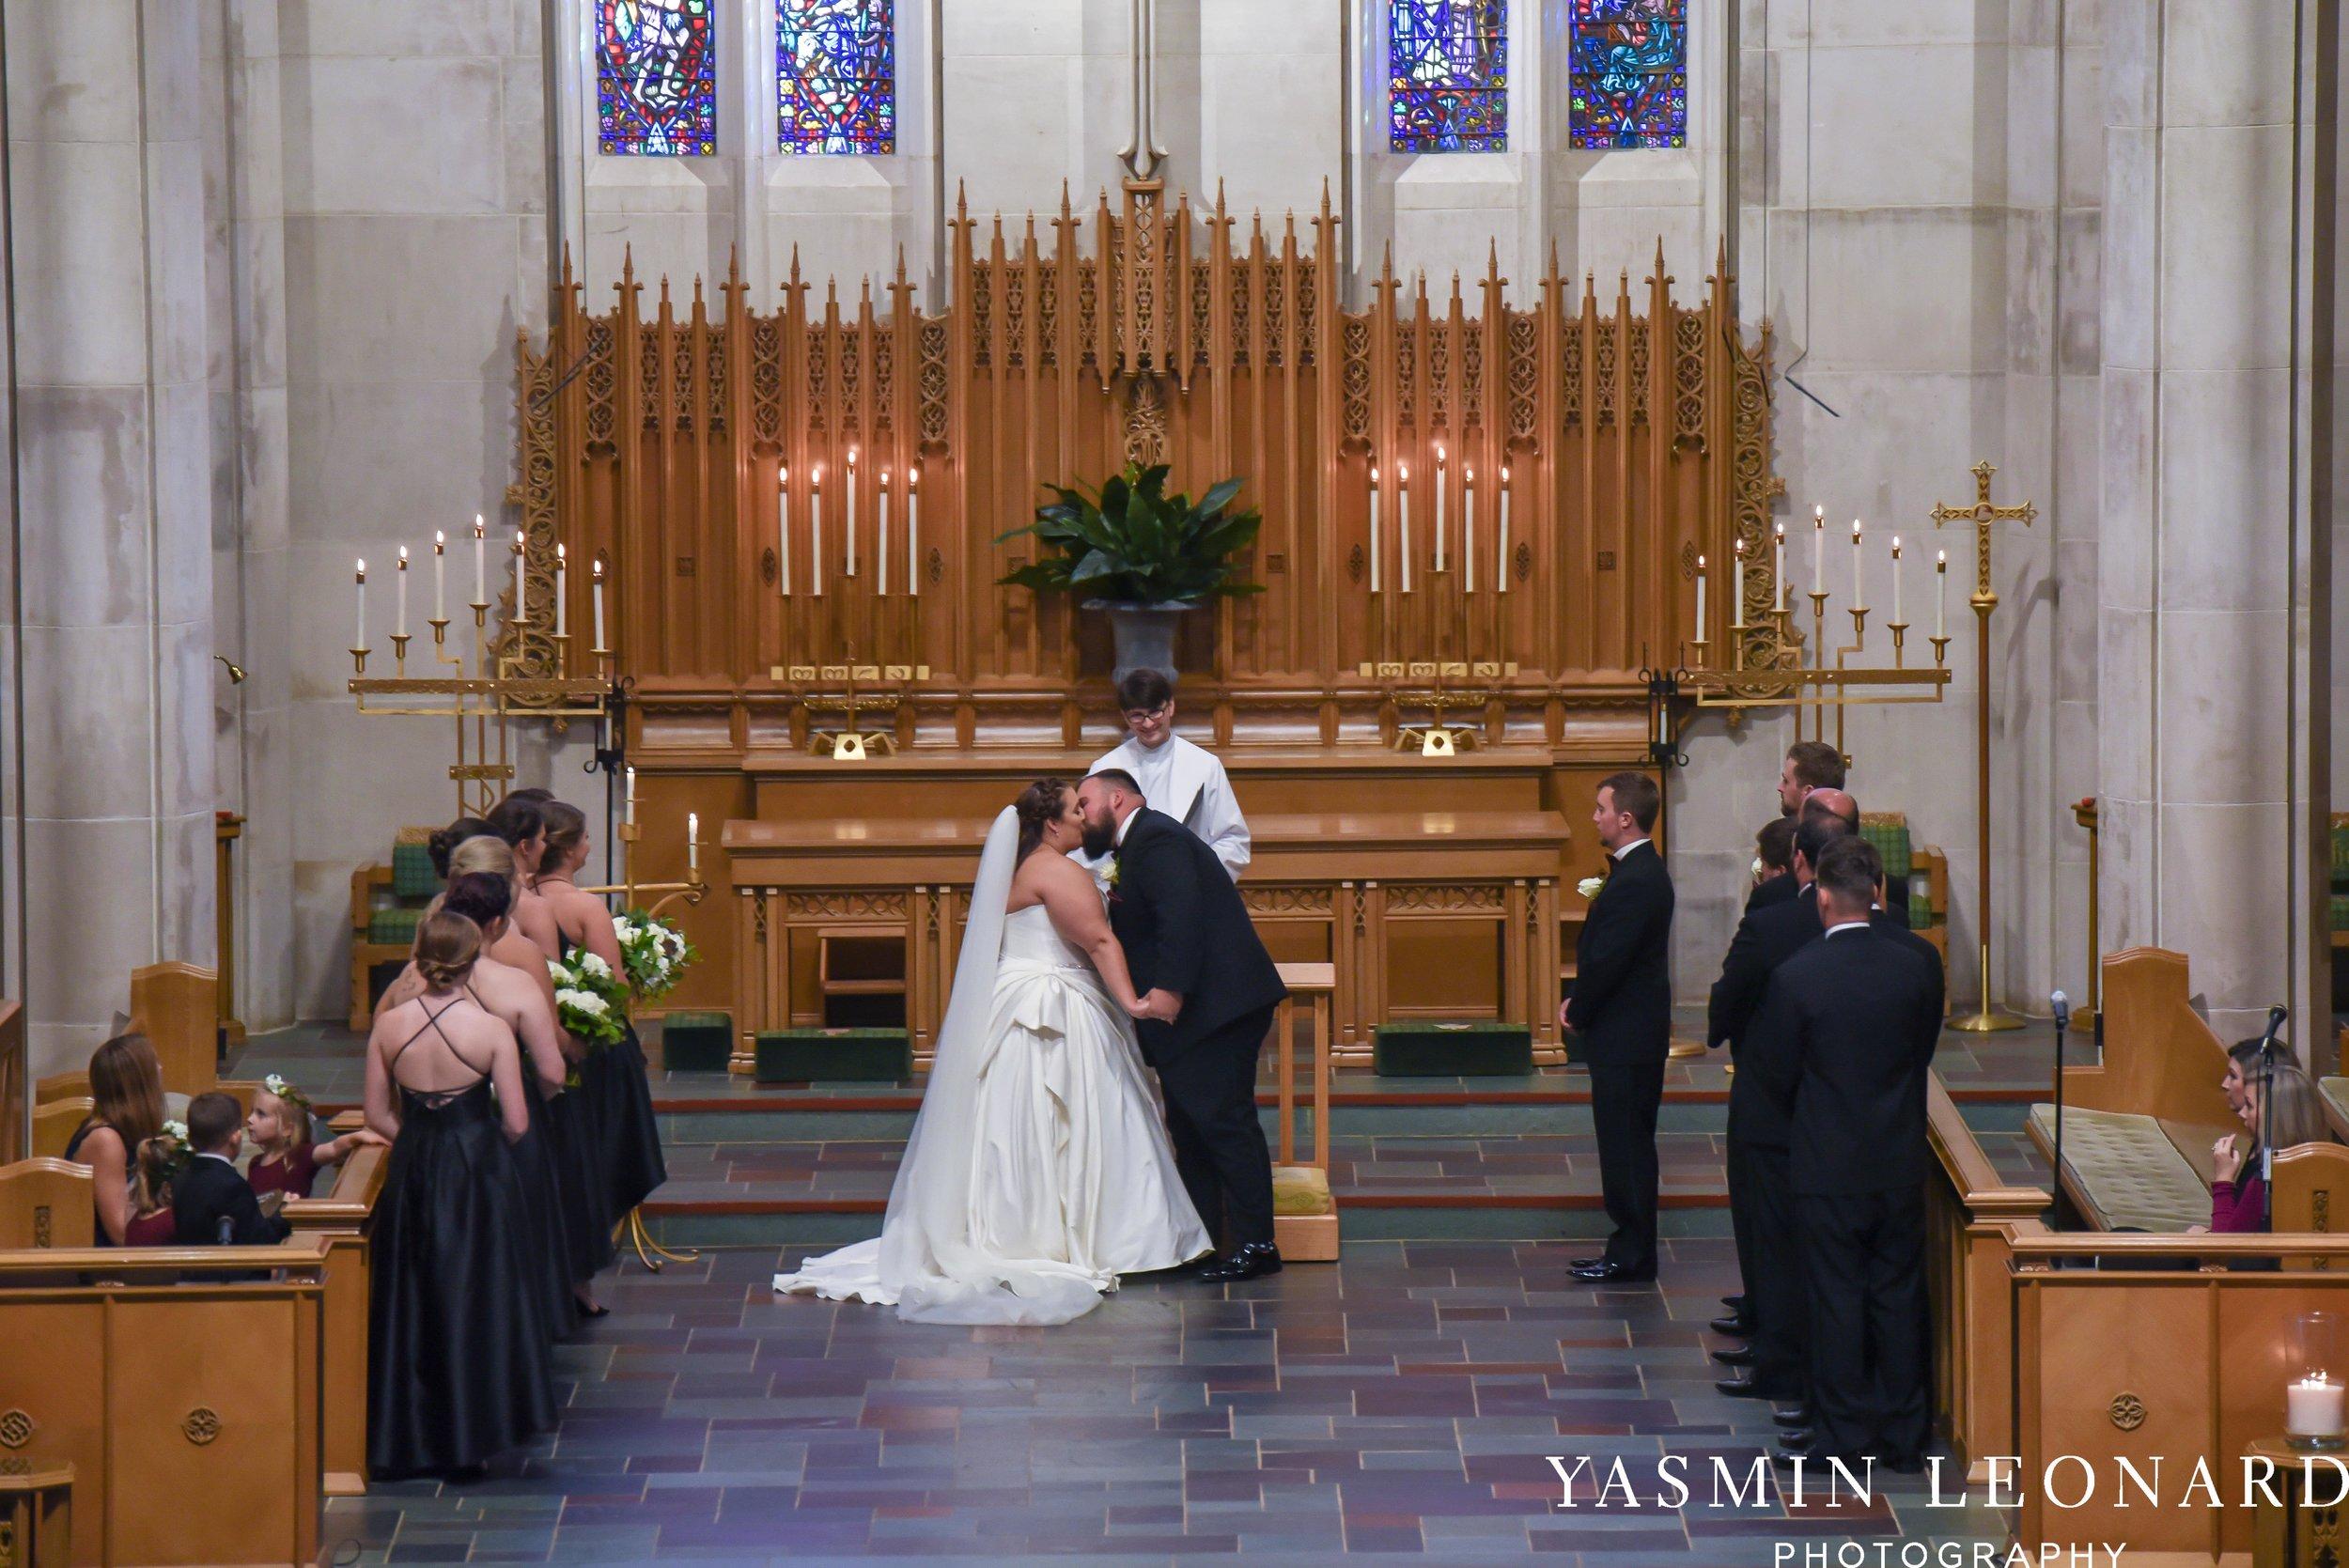 Wesley Memorial United Methodist Church - Old Homeplace Winery - High Point Weddings - High Point Wedding Photographer - NC Weddings - NC Barn Venue - Yasmin Leonard Photography-20.jpg